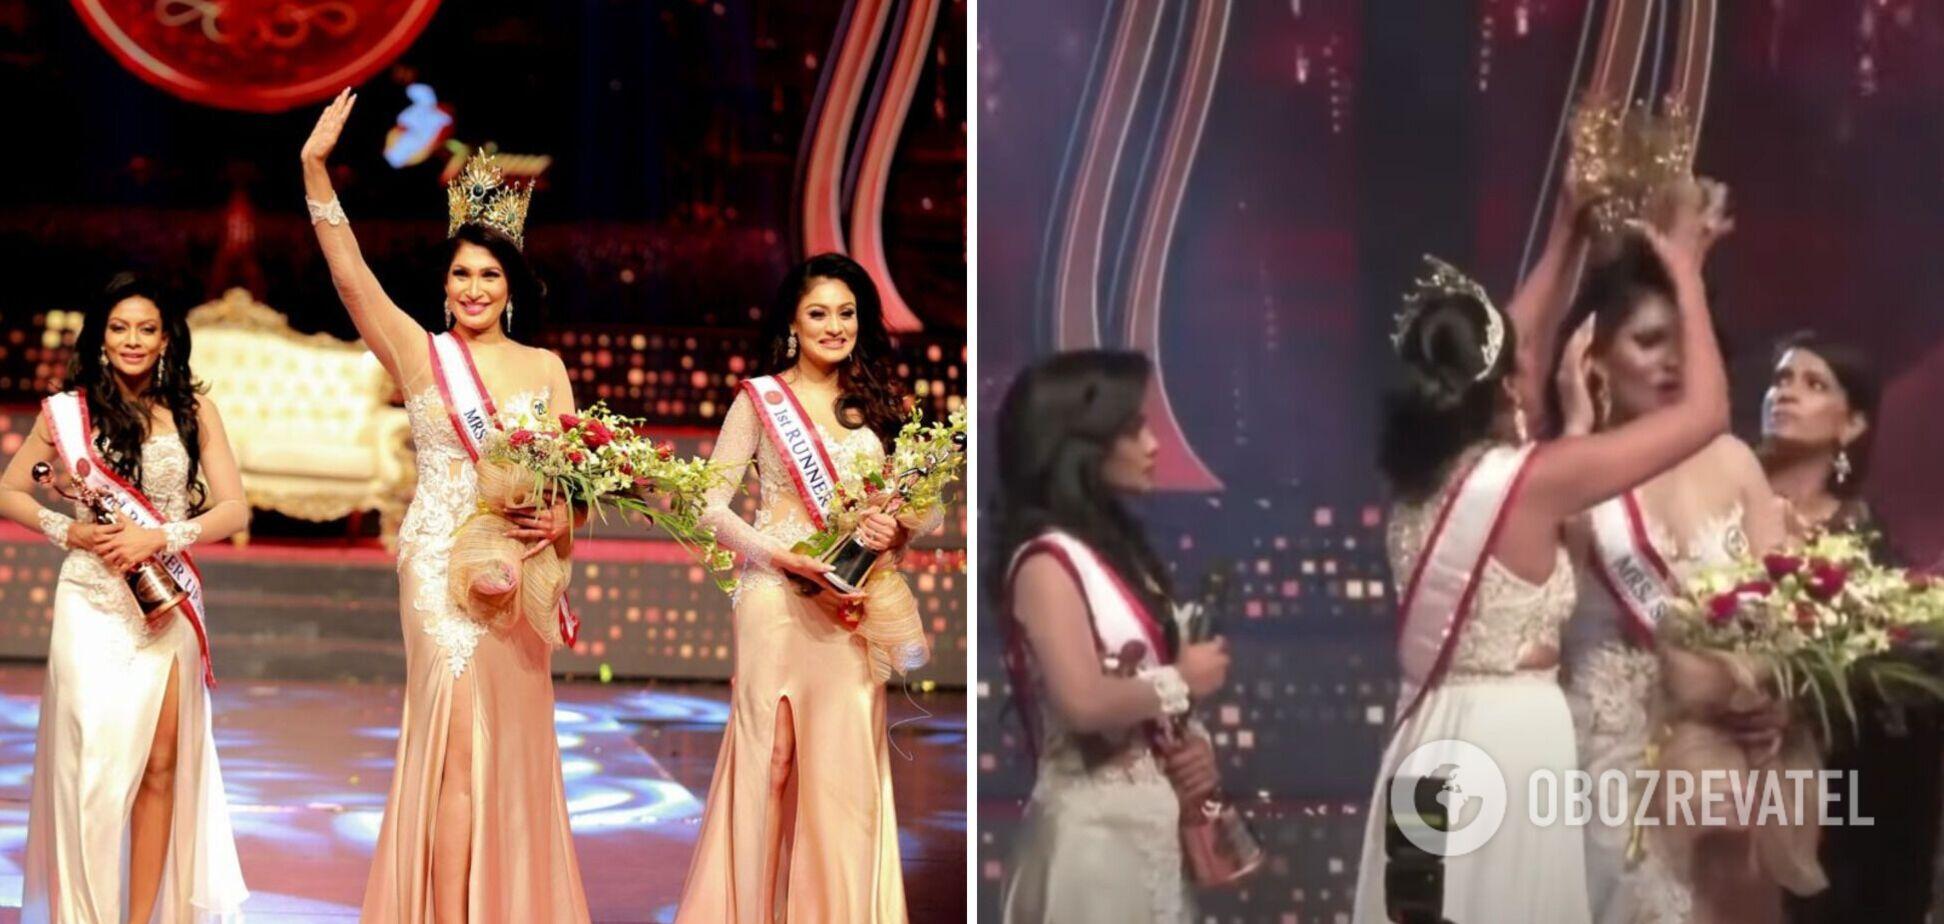 На конкурсе 'Миссис Шри-Ланка' с победительницы сорвали корону. Видео